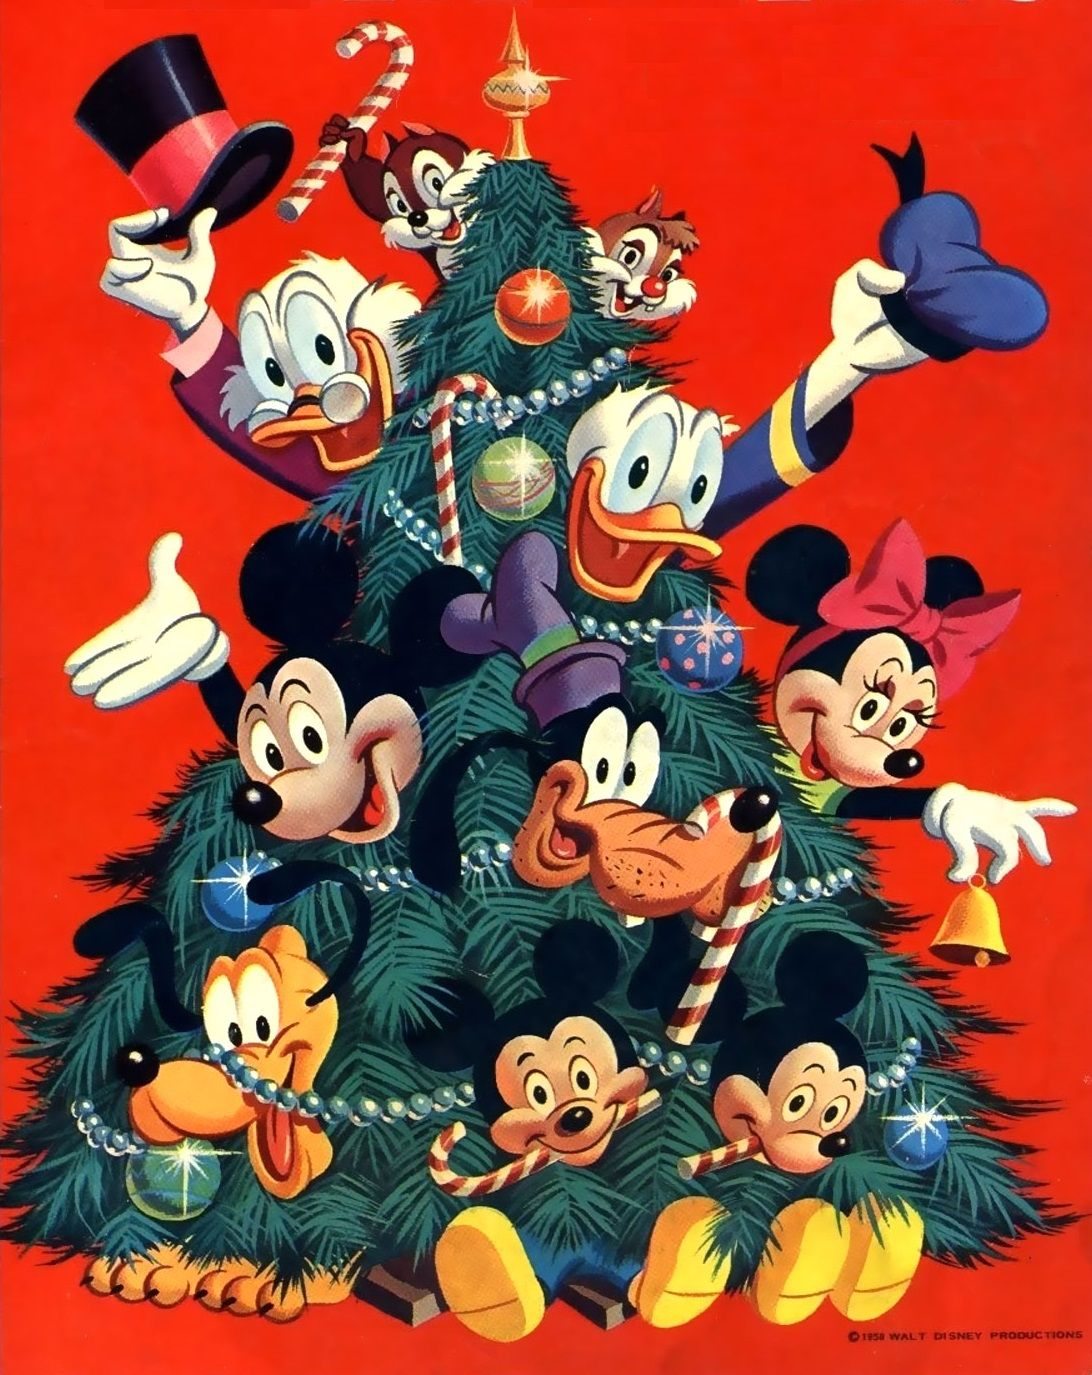 Walt Disney Christmas Greetings Christmas Tree With All The Characters Disney Christmas Parade Disney Christmas Disney Merry Christmas